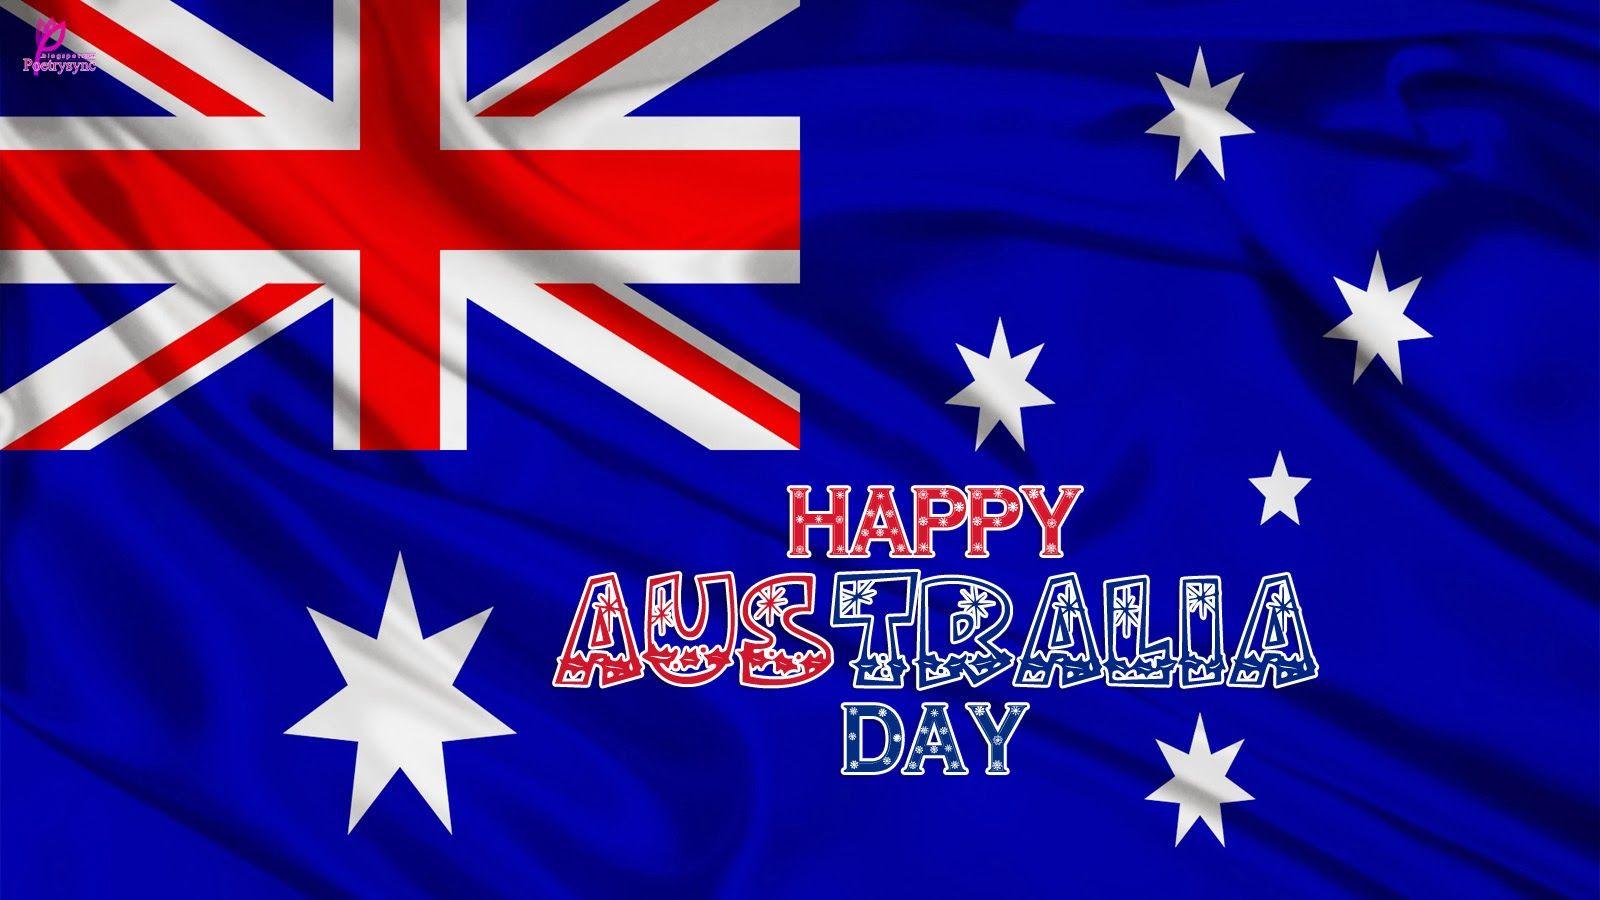 Australia Day 26 January Wishes On Australia Flag Wallpaper Happy Australia Day Australia Day Day Wishes